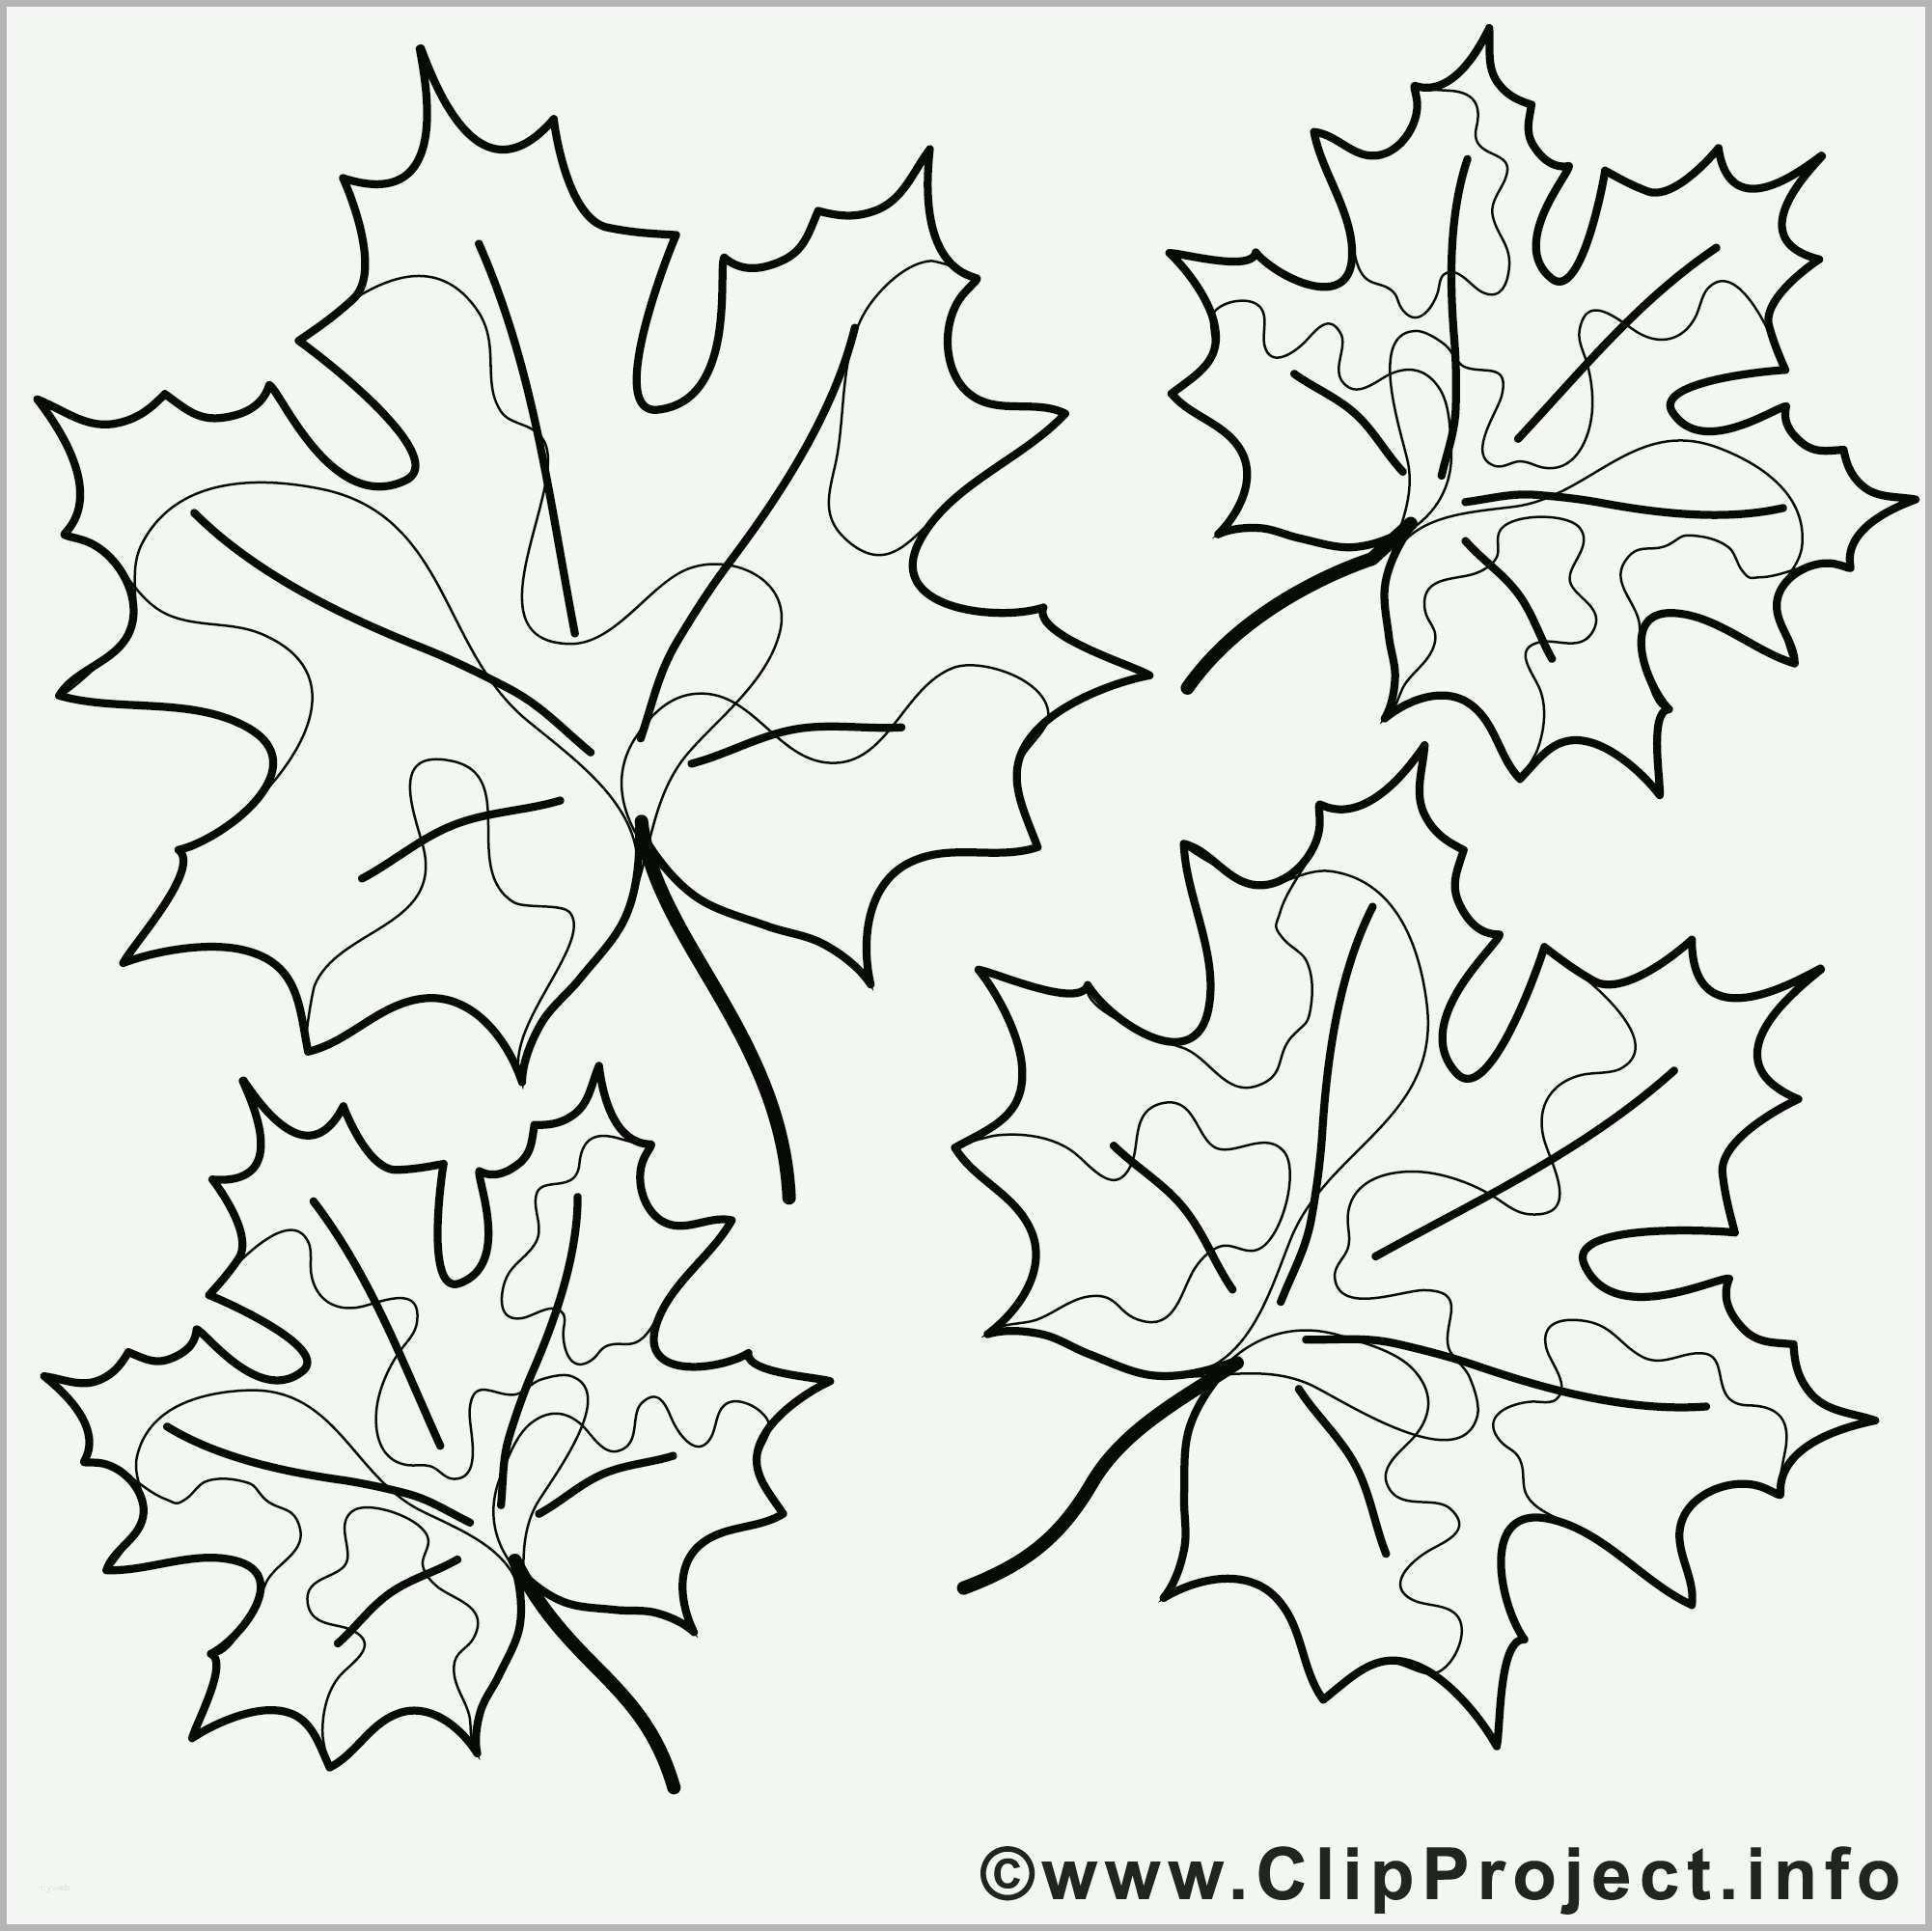 phänomenal window color vorlagen herbst best ahornblatt